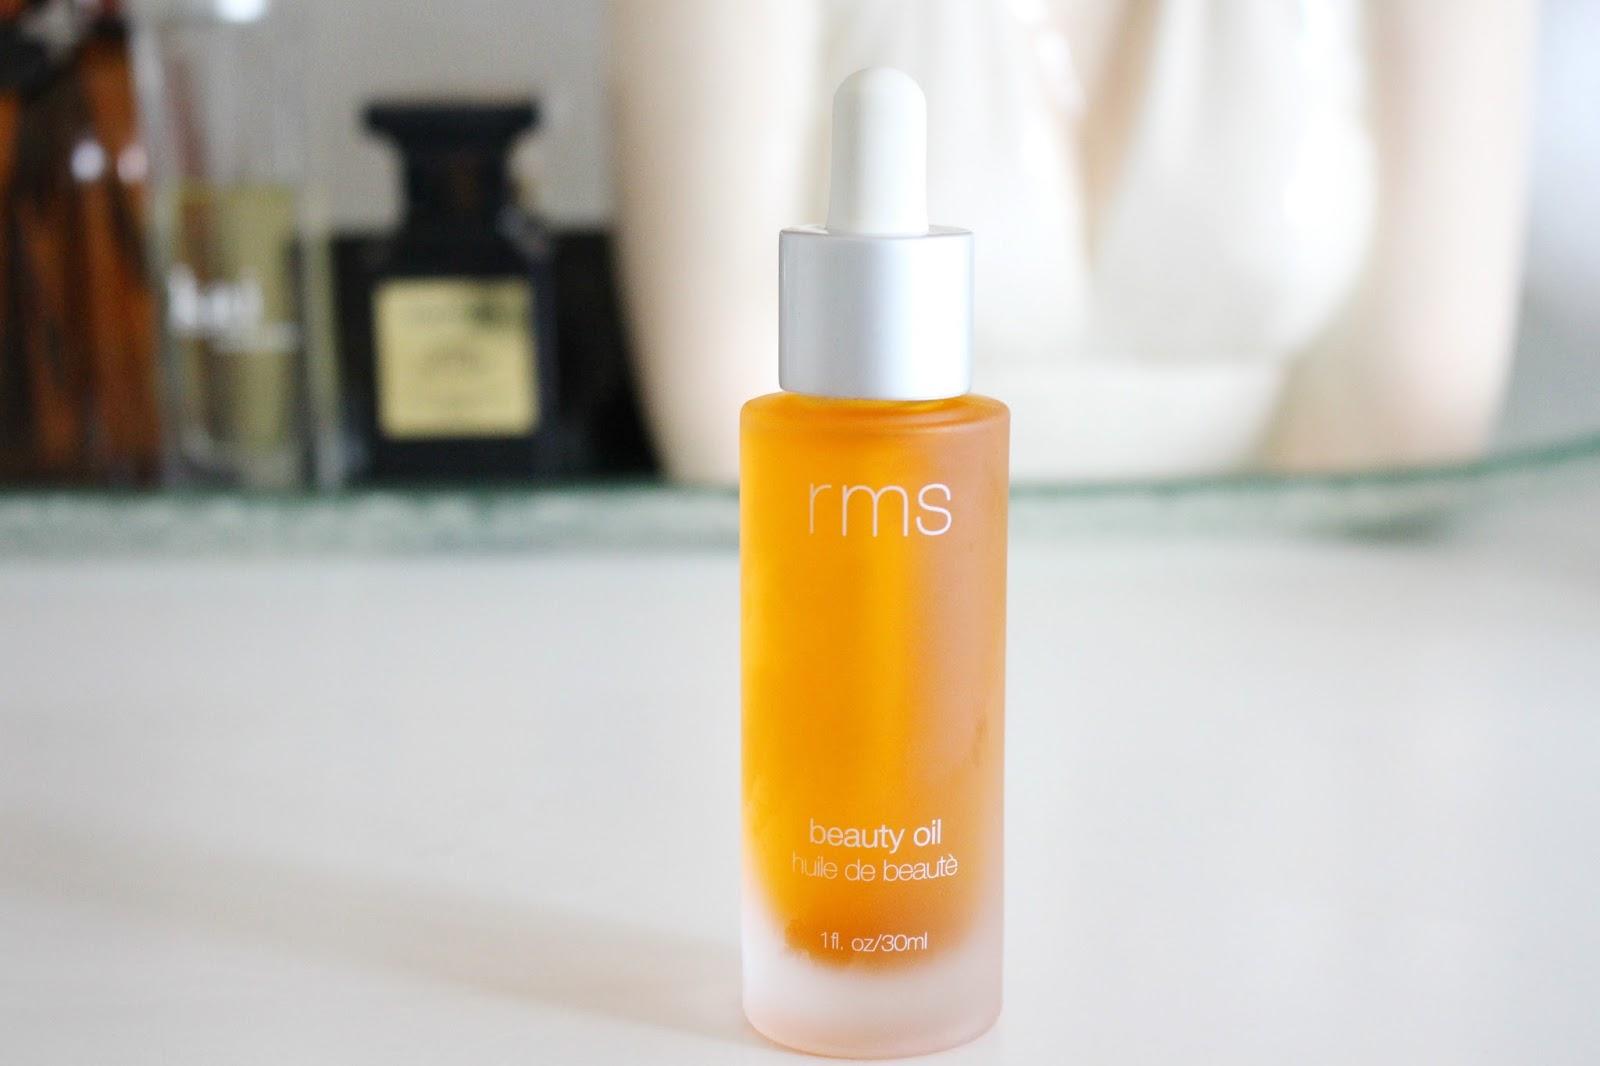 beauty oils for combination skin, facial oils for combination skin, rms beauty oil